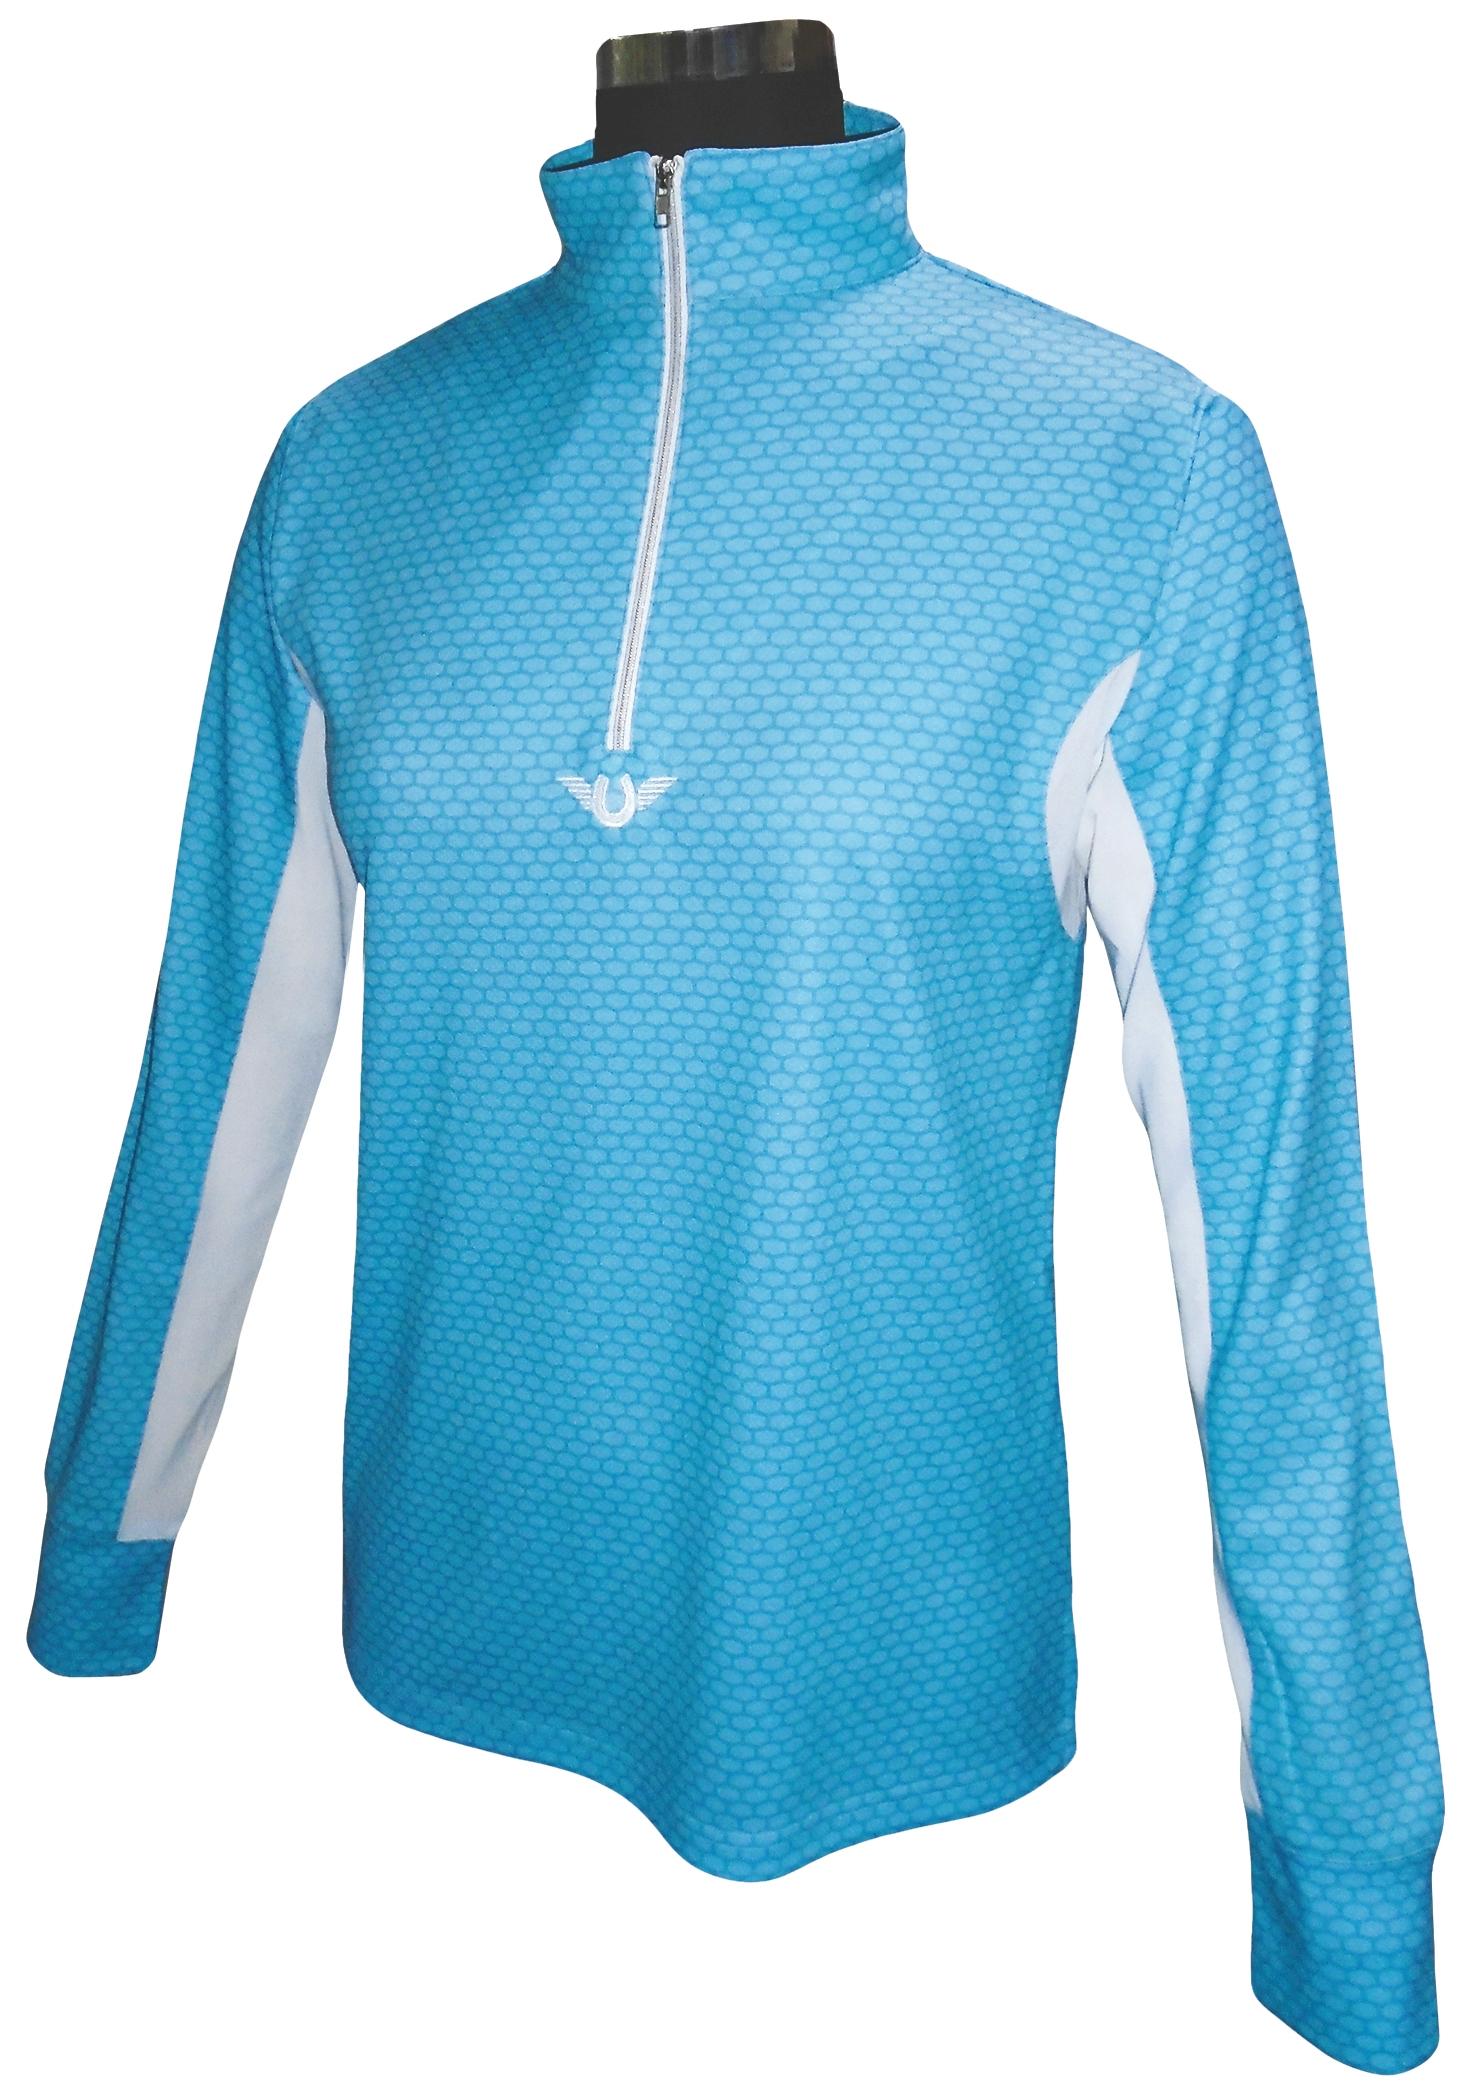 TuffRider Ladies' Neon Block Long Sleeve Technical Shirt